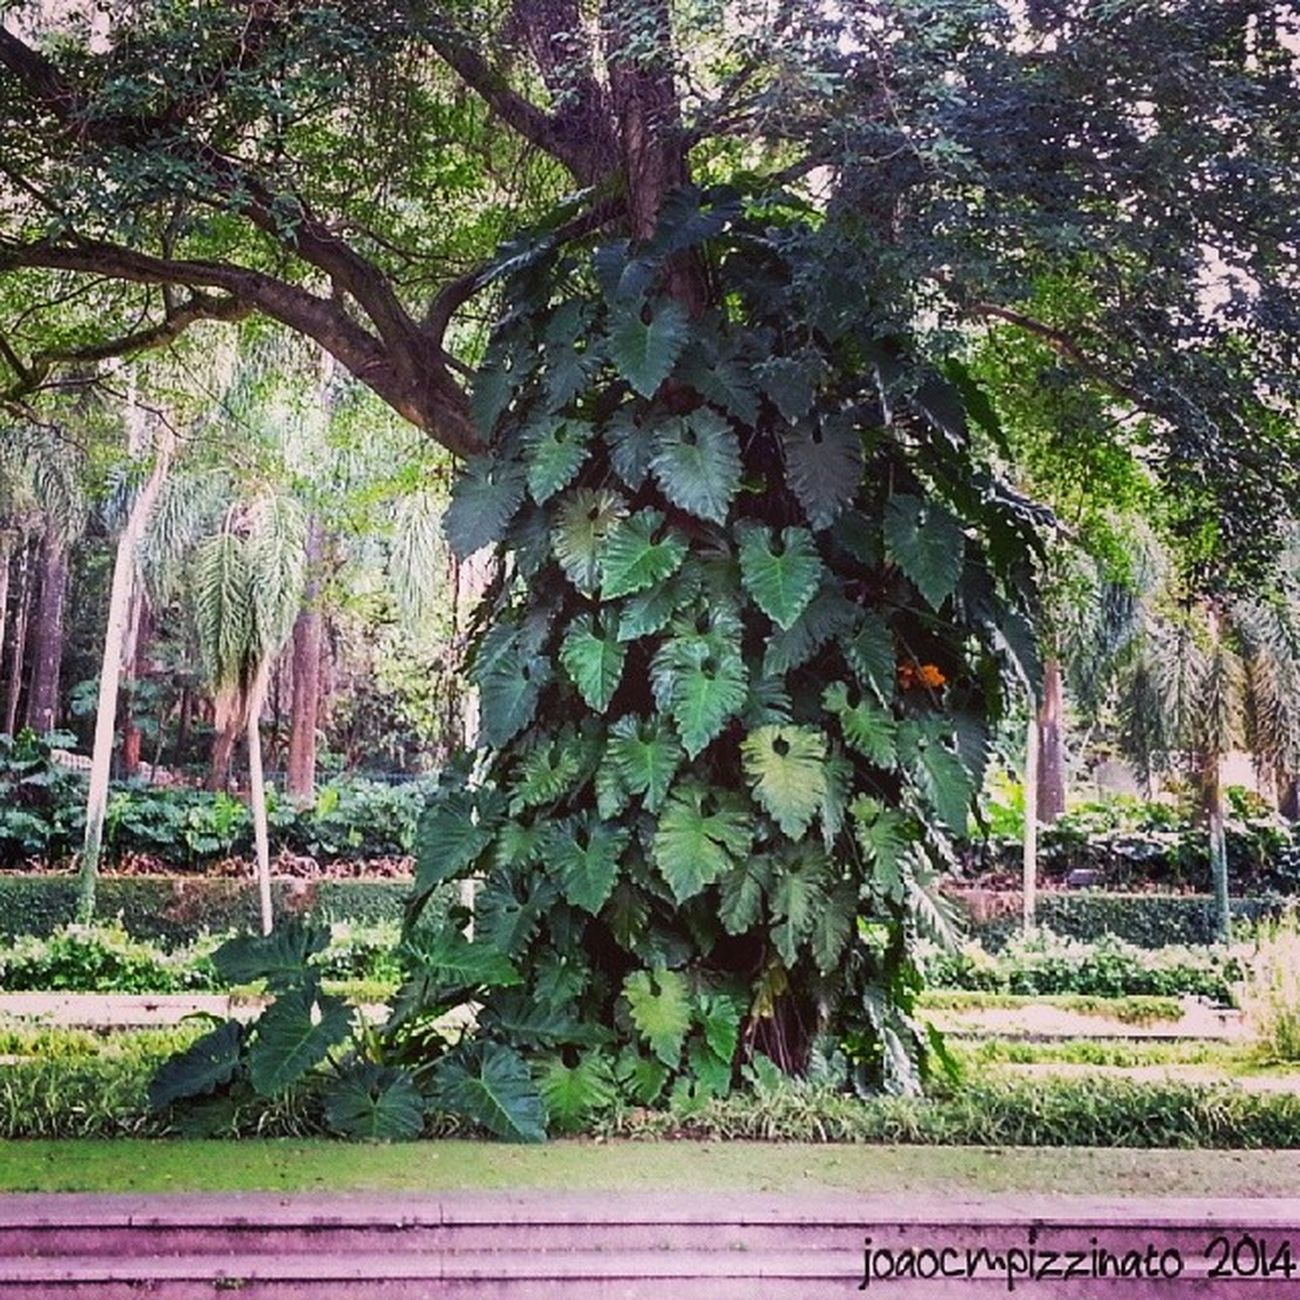 Nature in the city. Tree Plants Nature Colors city zonasul saopaulo brasil photography burlemarx